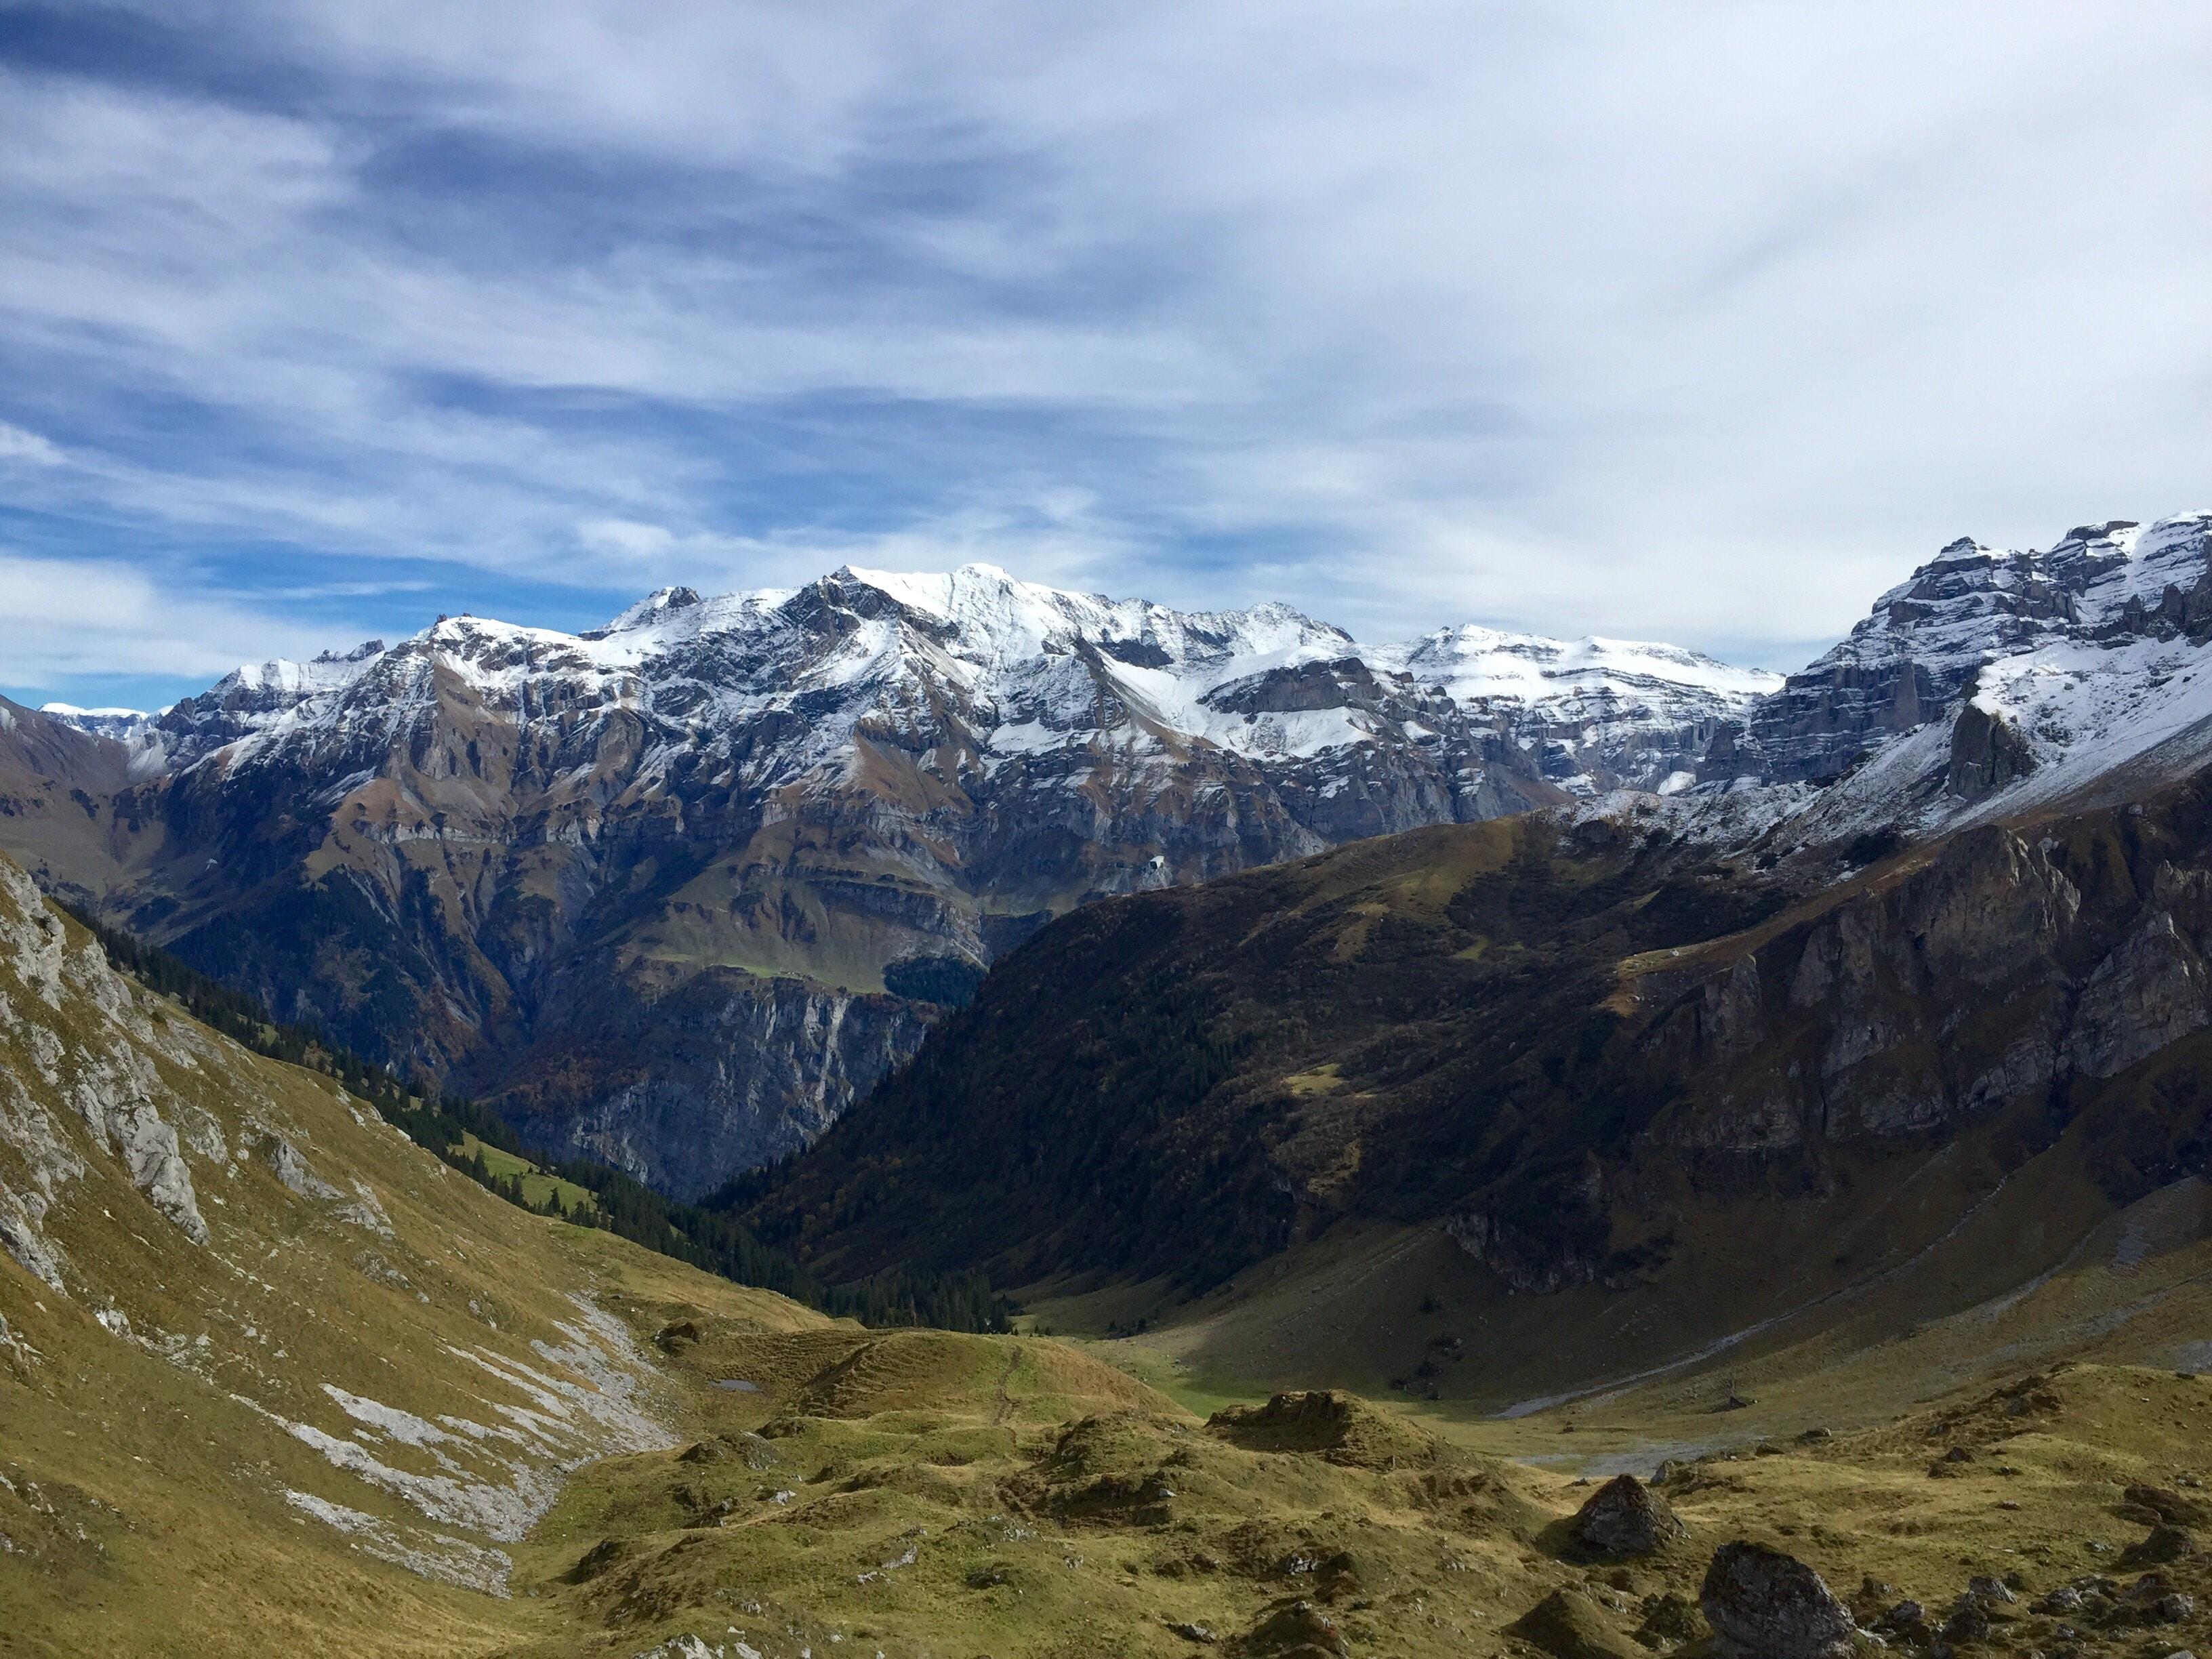 photo of mountain during daytime